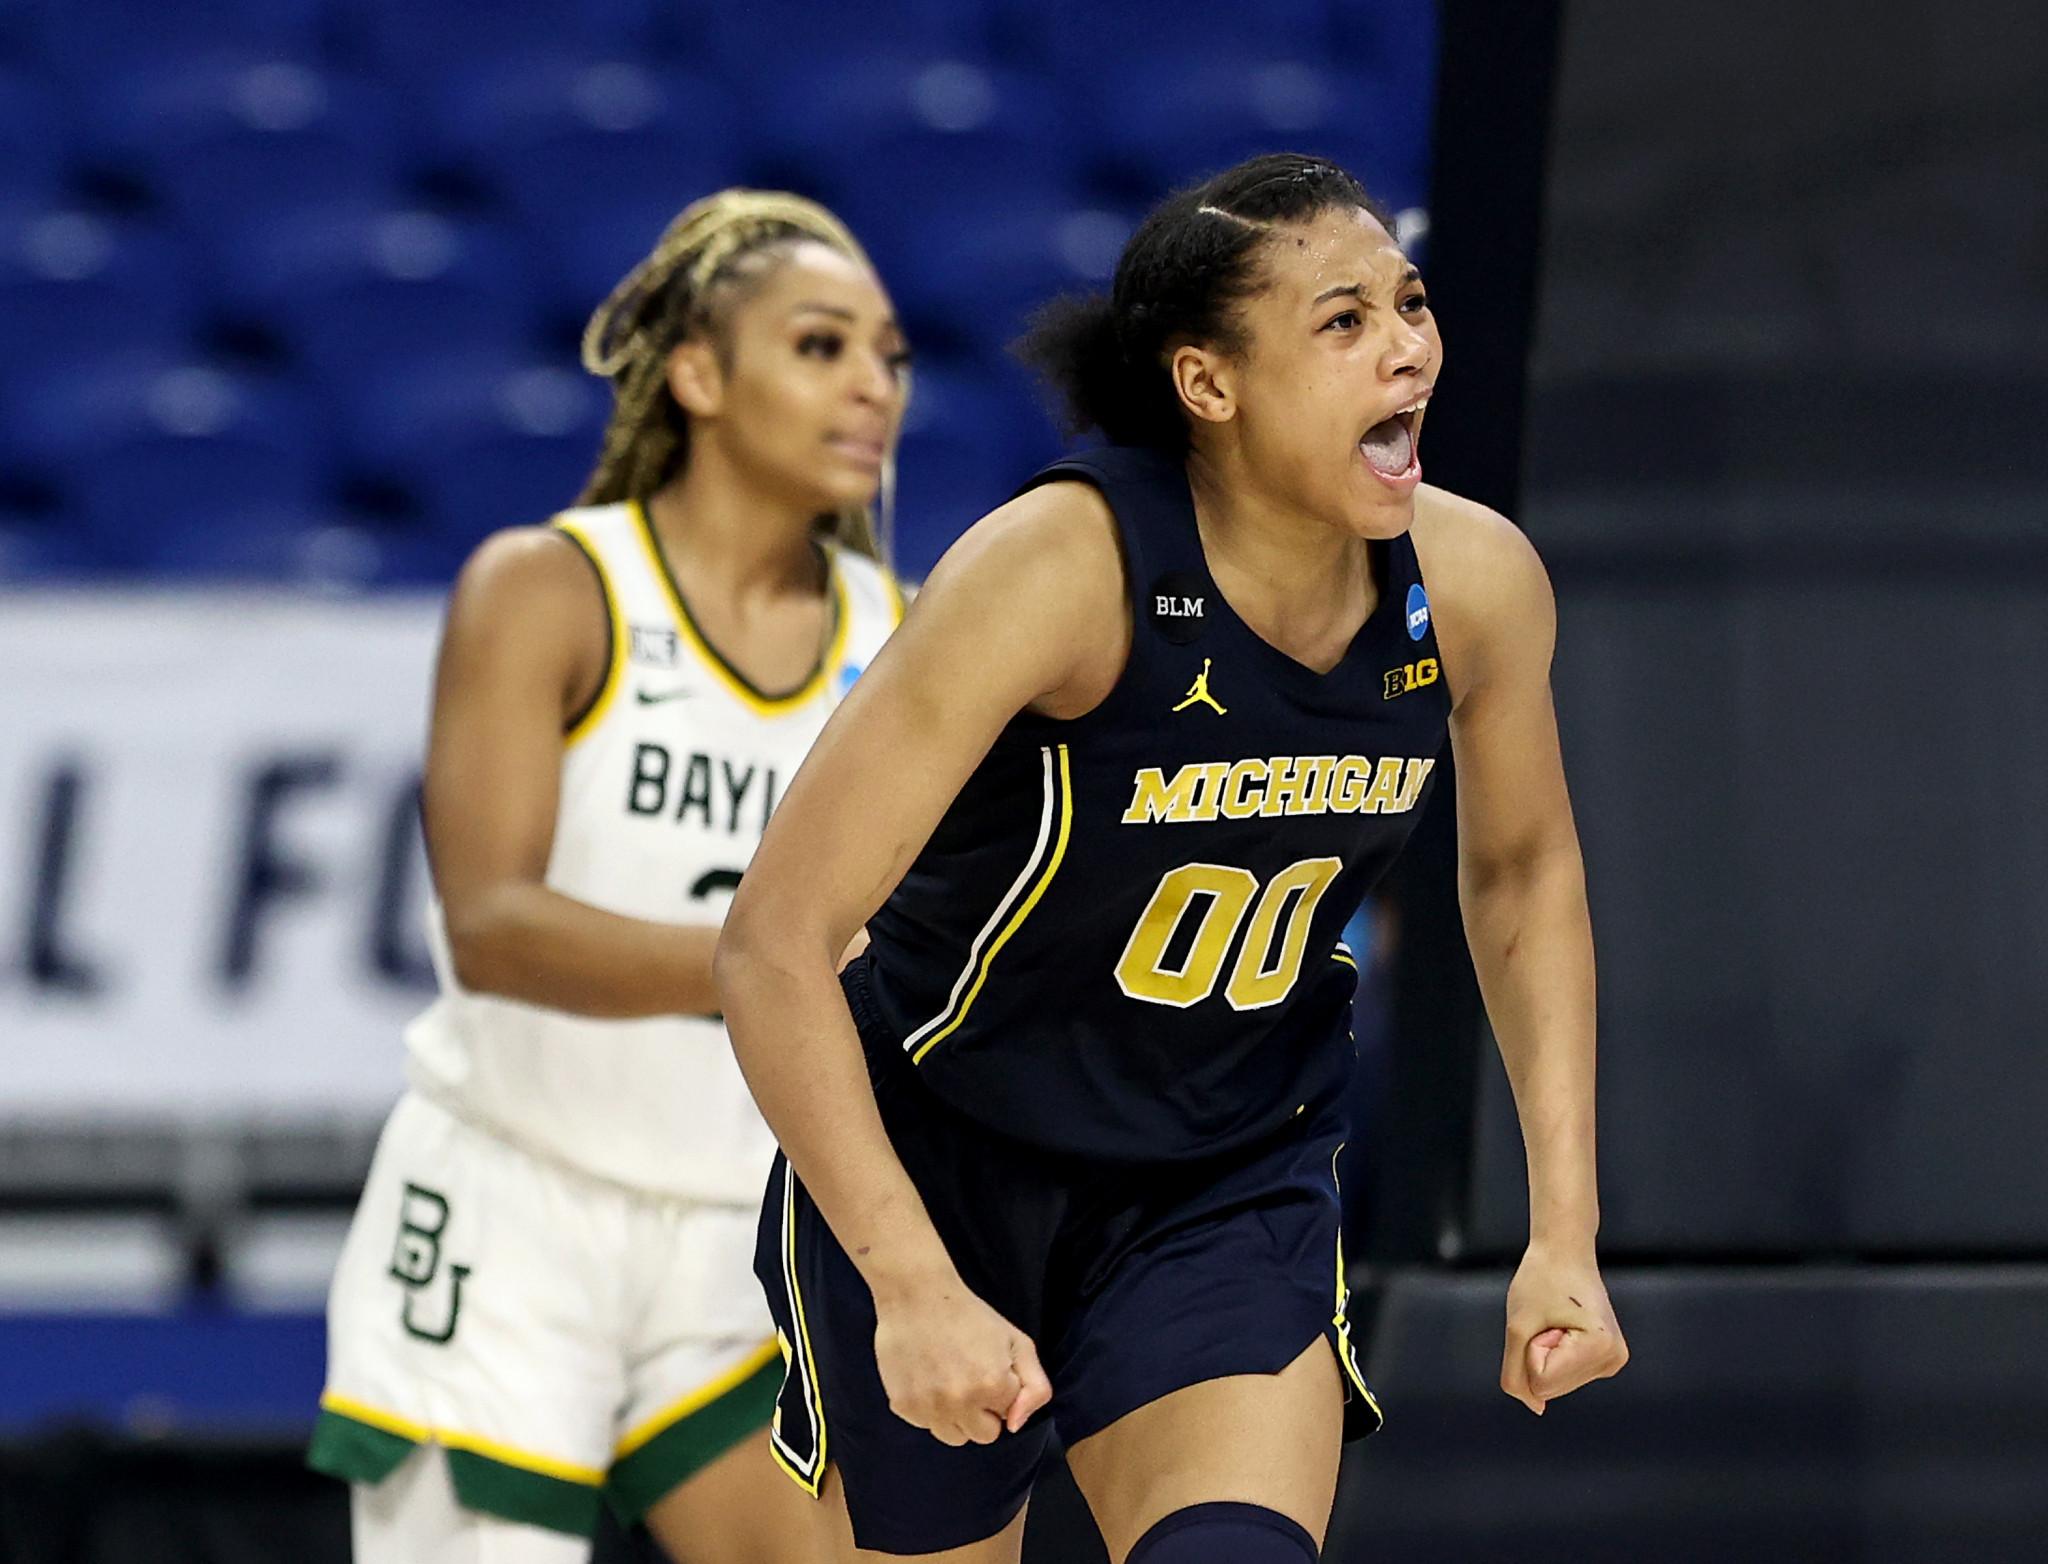 United States cruise through as semi-finals set at FIBA Women's AmeriCup